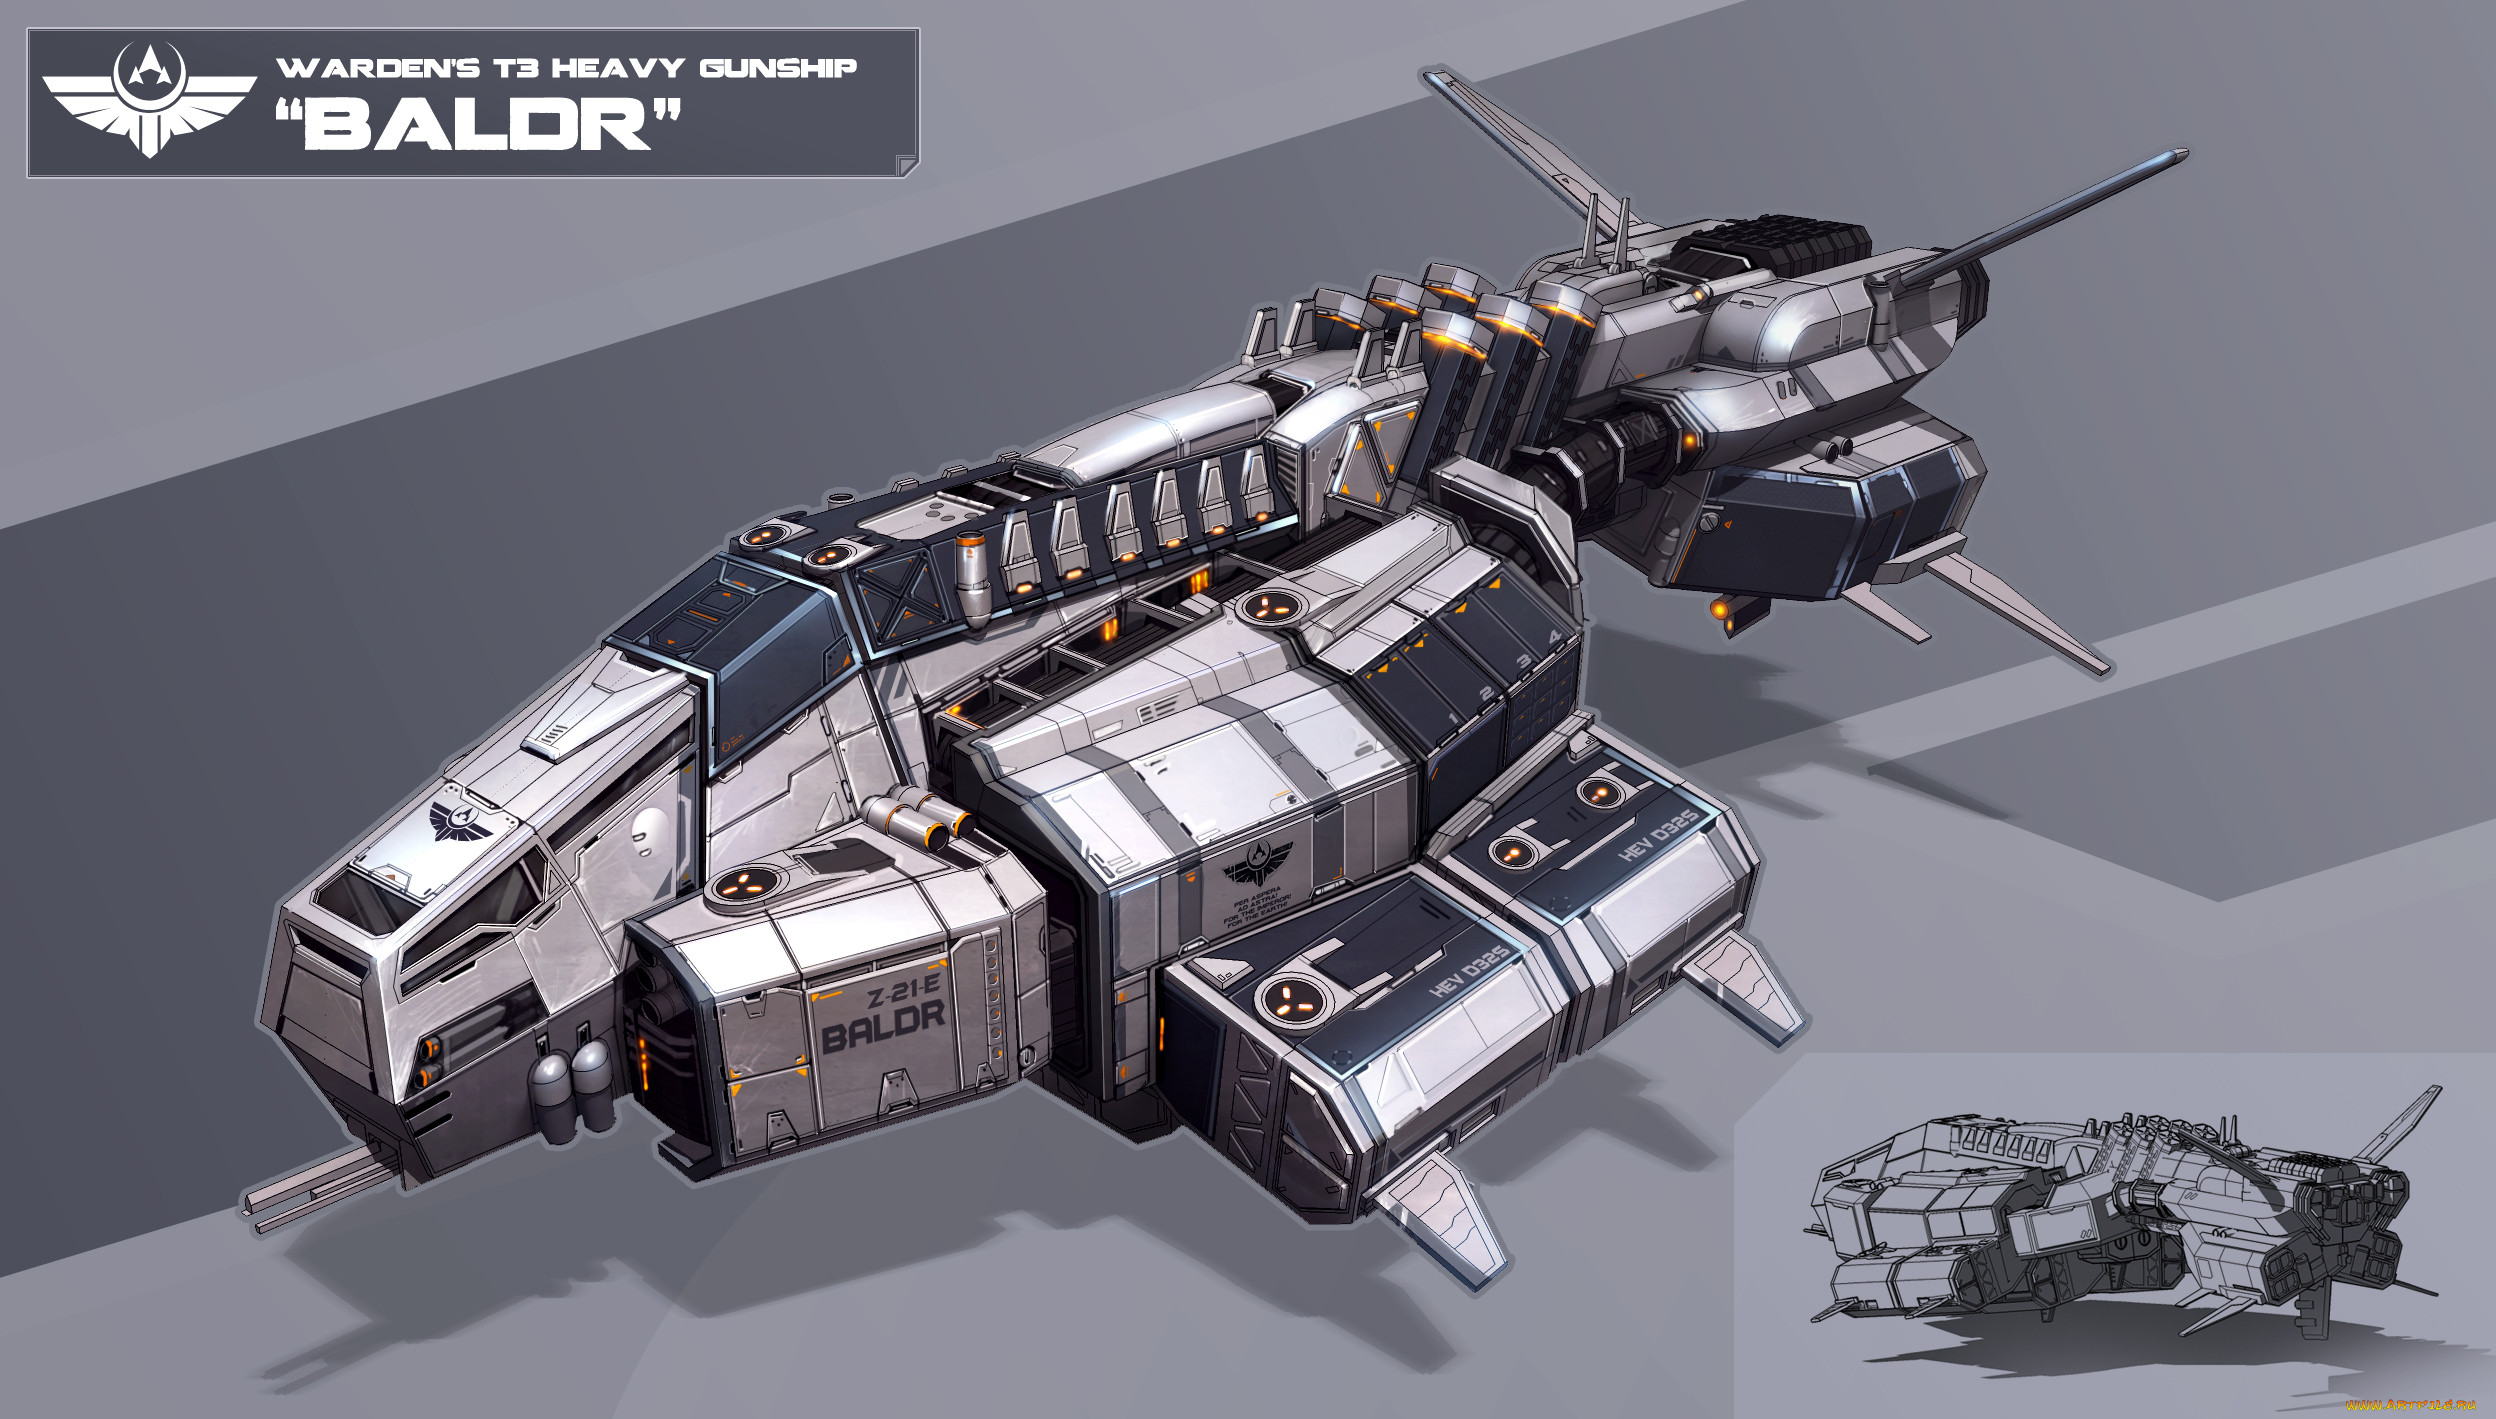 Star conflict: elite pilot (2013) promotional art mobygames.